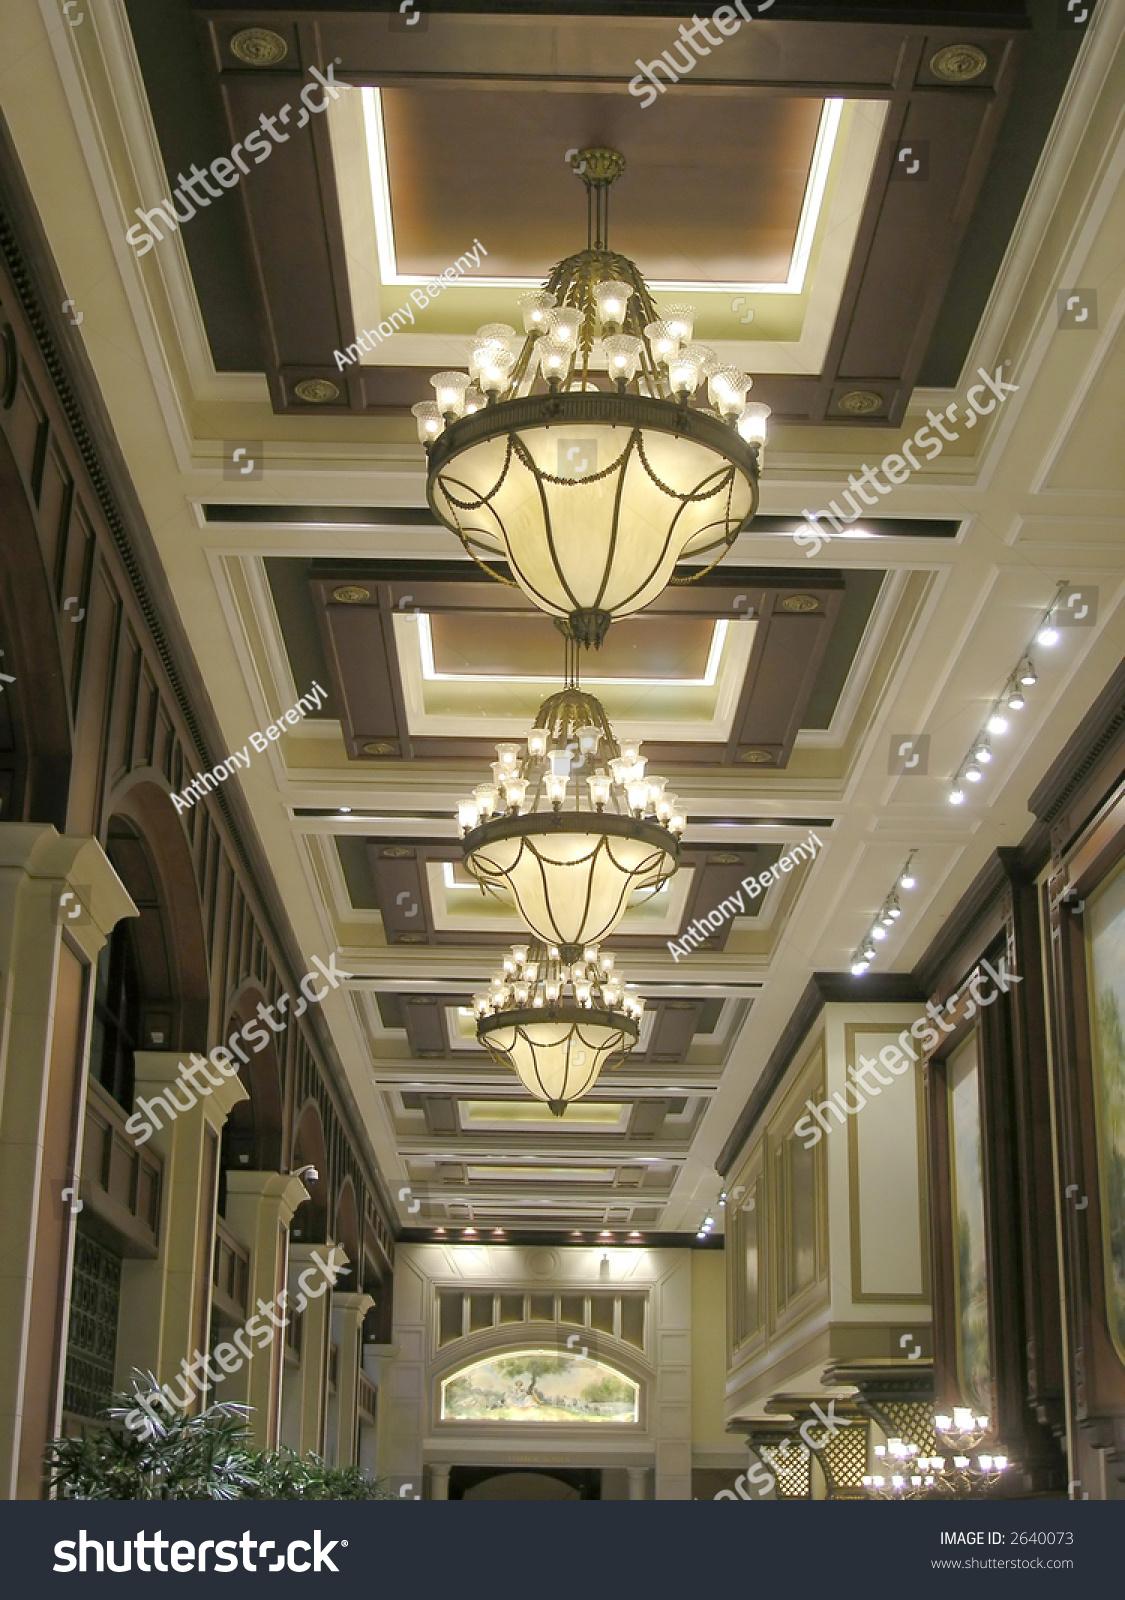 Luxury Hotel Lobby Ornate Lamps San Stock Photo 2640073